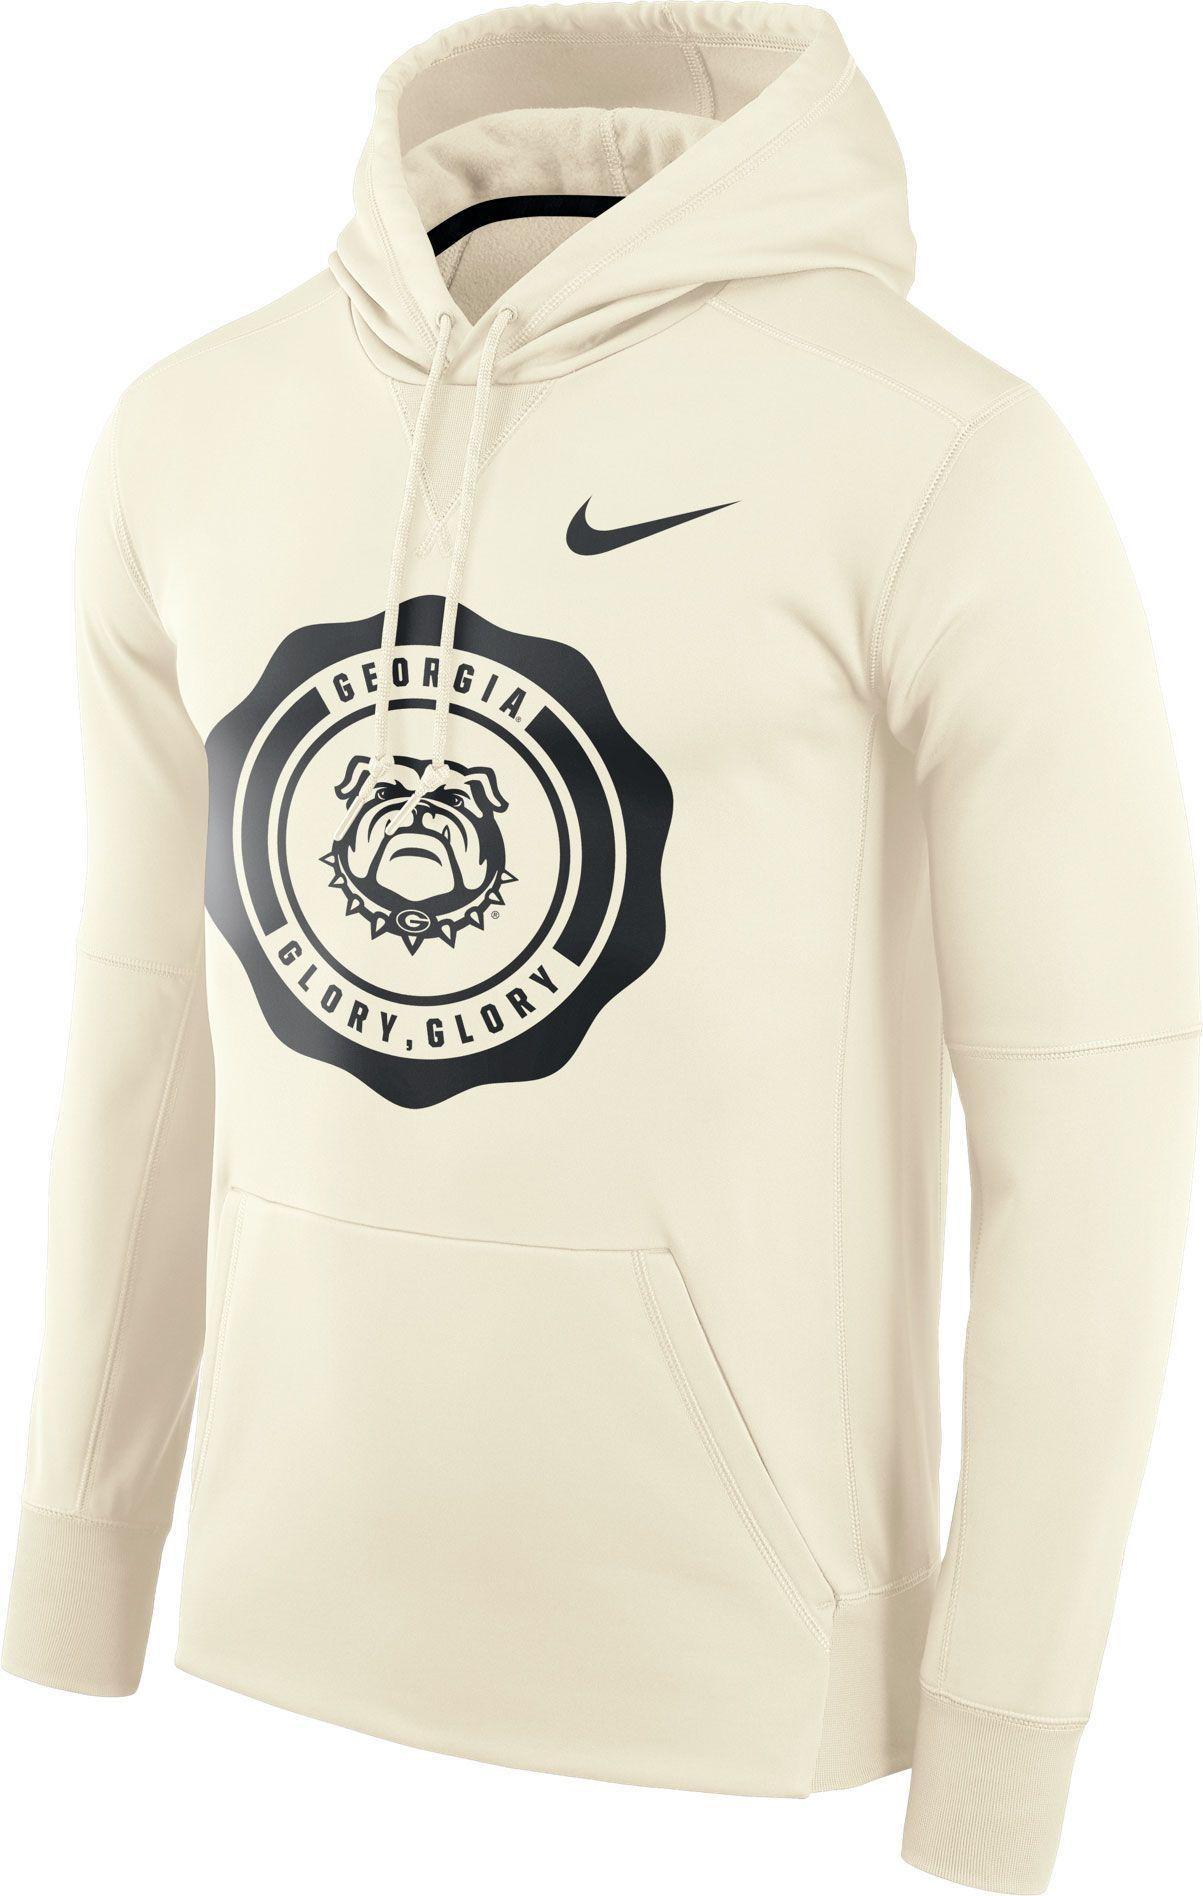 76b5508b5 Nike Men's Georgia Bulldogs Therma-FIT Rival White Pullover Hoodie, Team